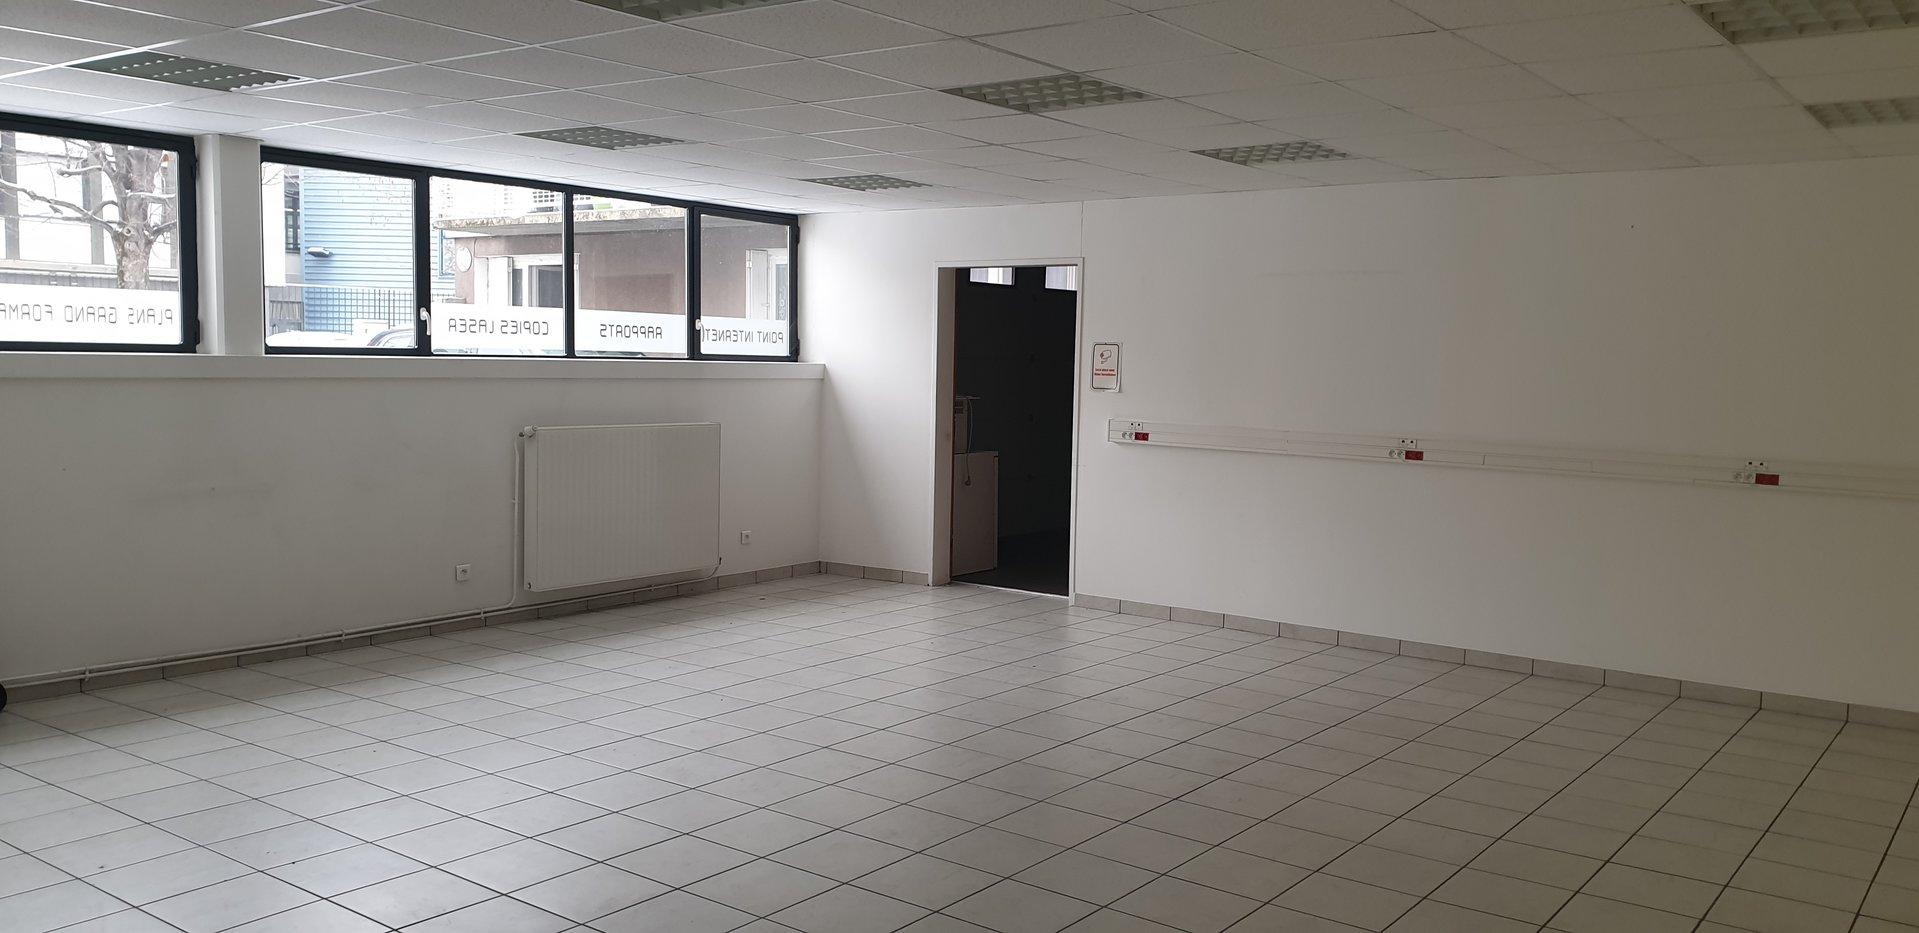 Sale Local - Le Puy-en-Velay